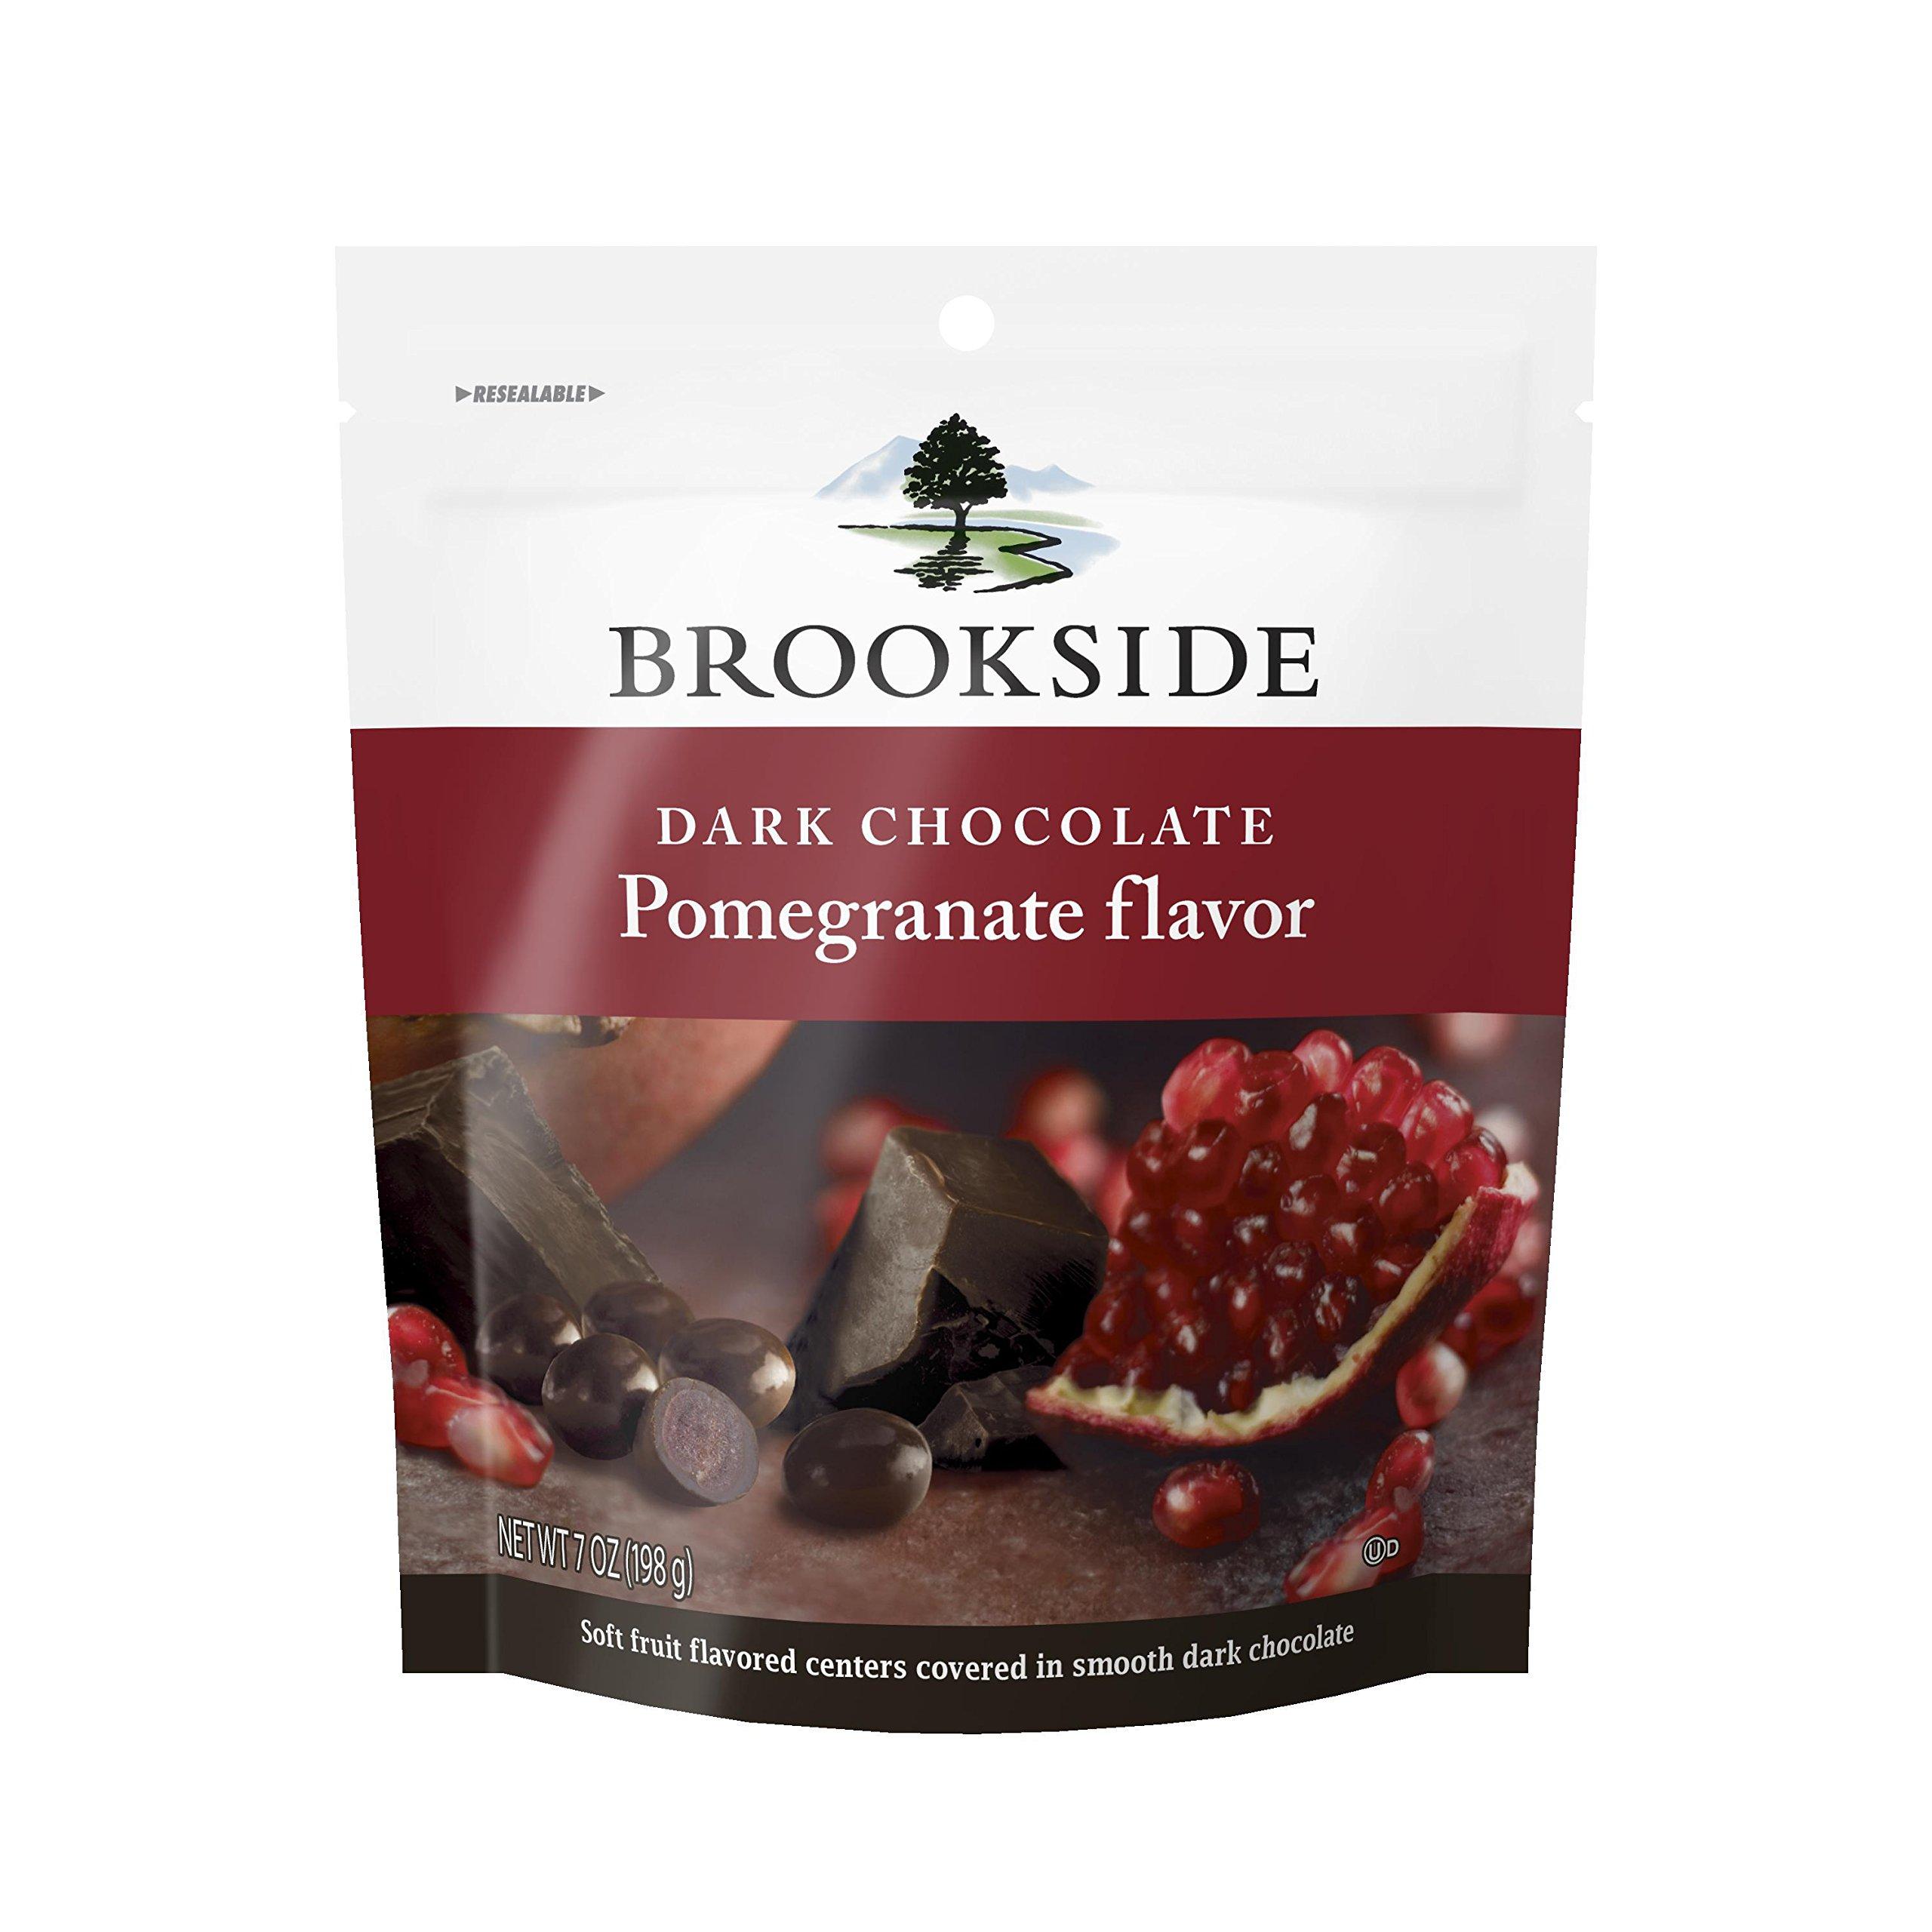 BROOKSIDE Dark Chocolate Pomegranate Flavor, 7 Ounce